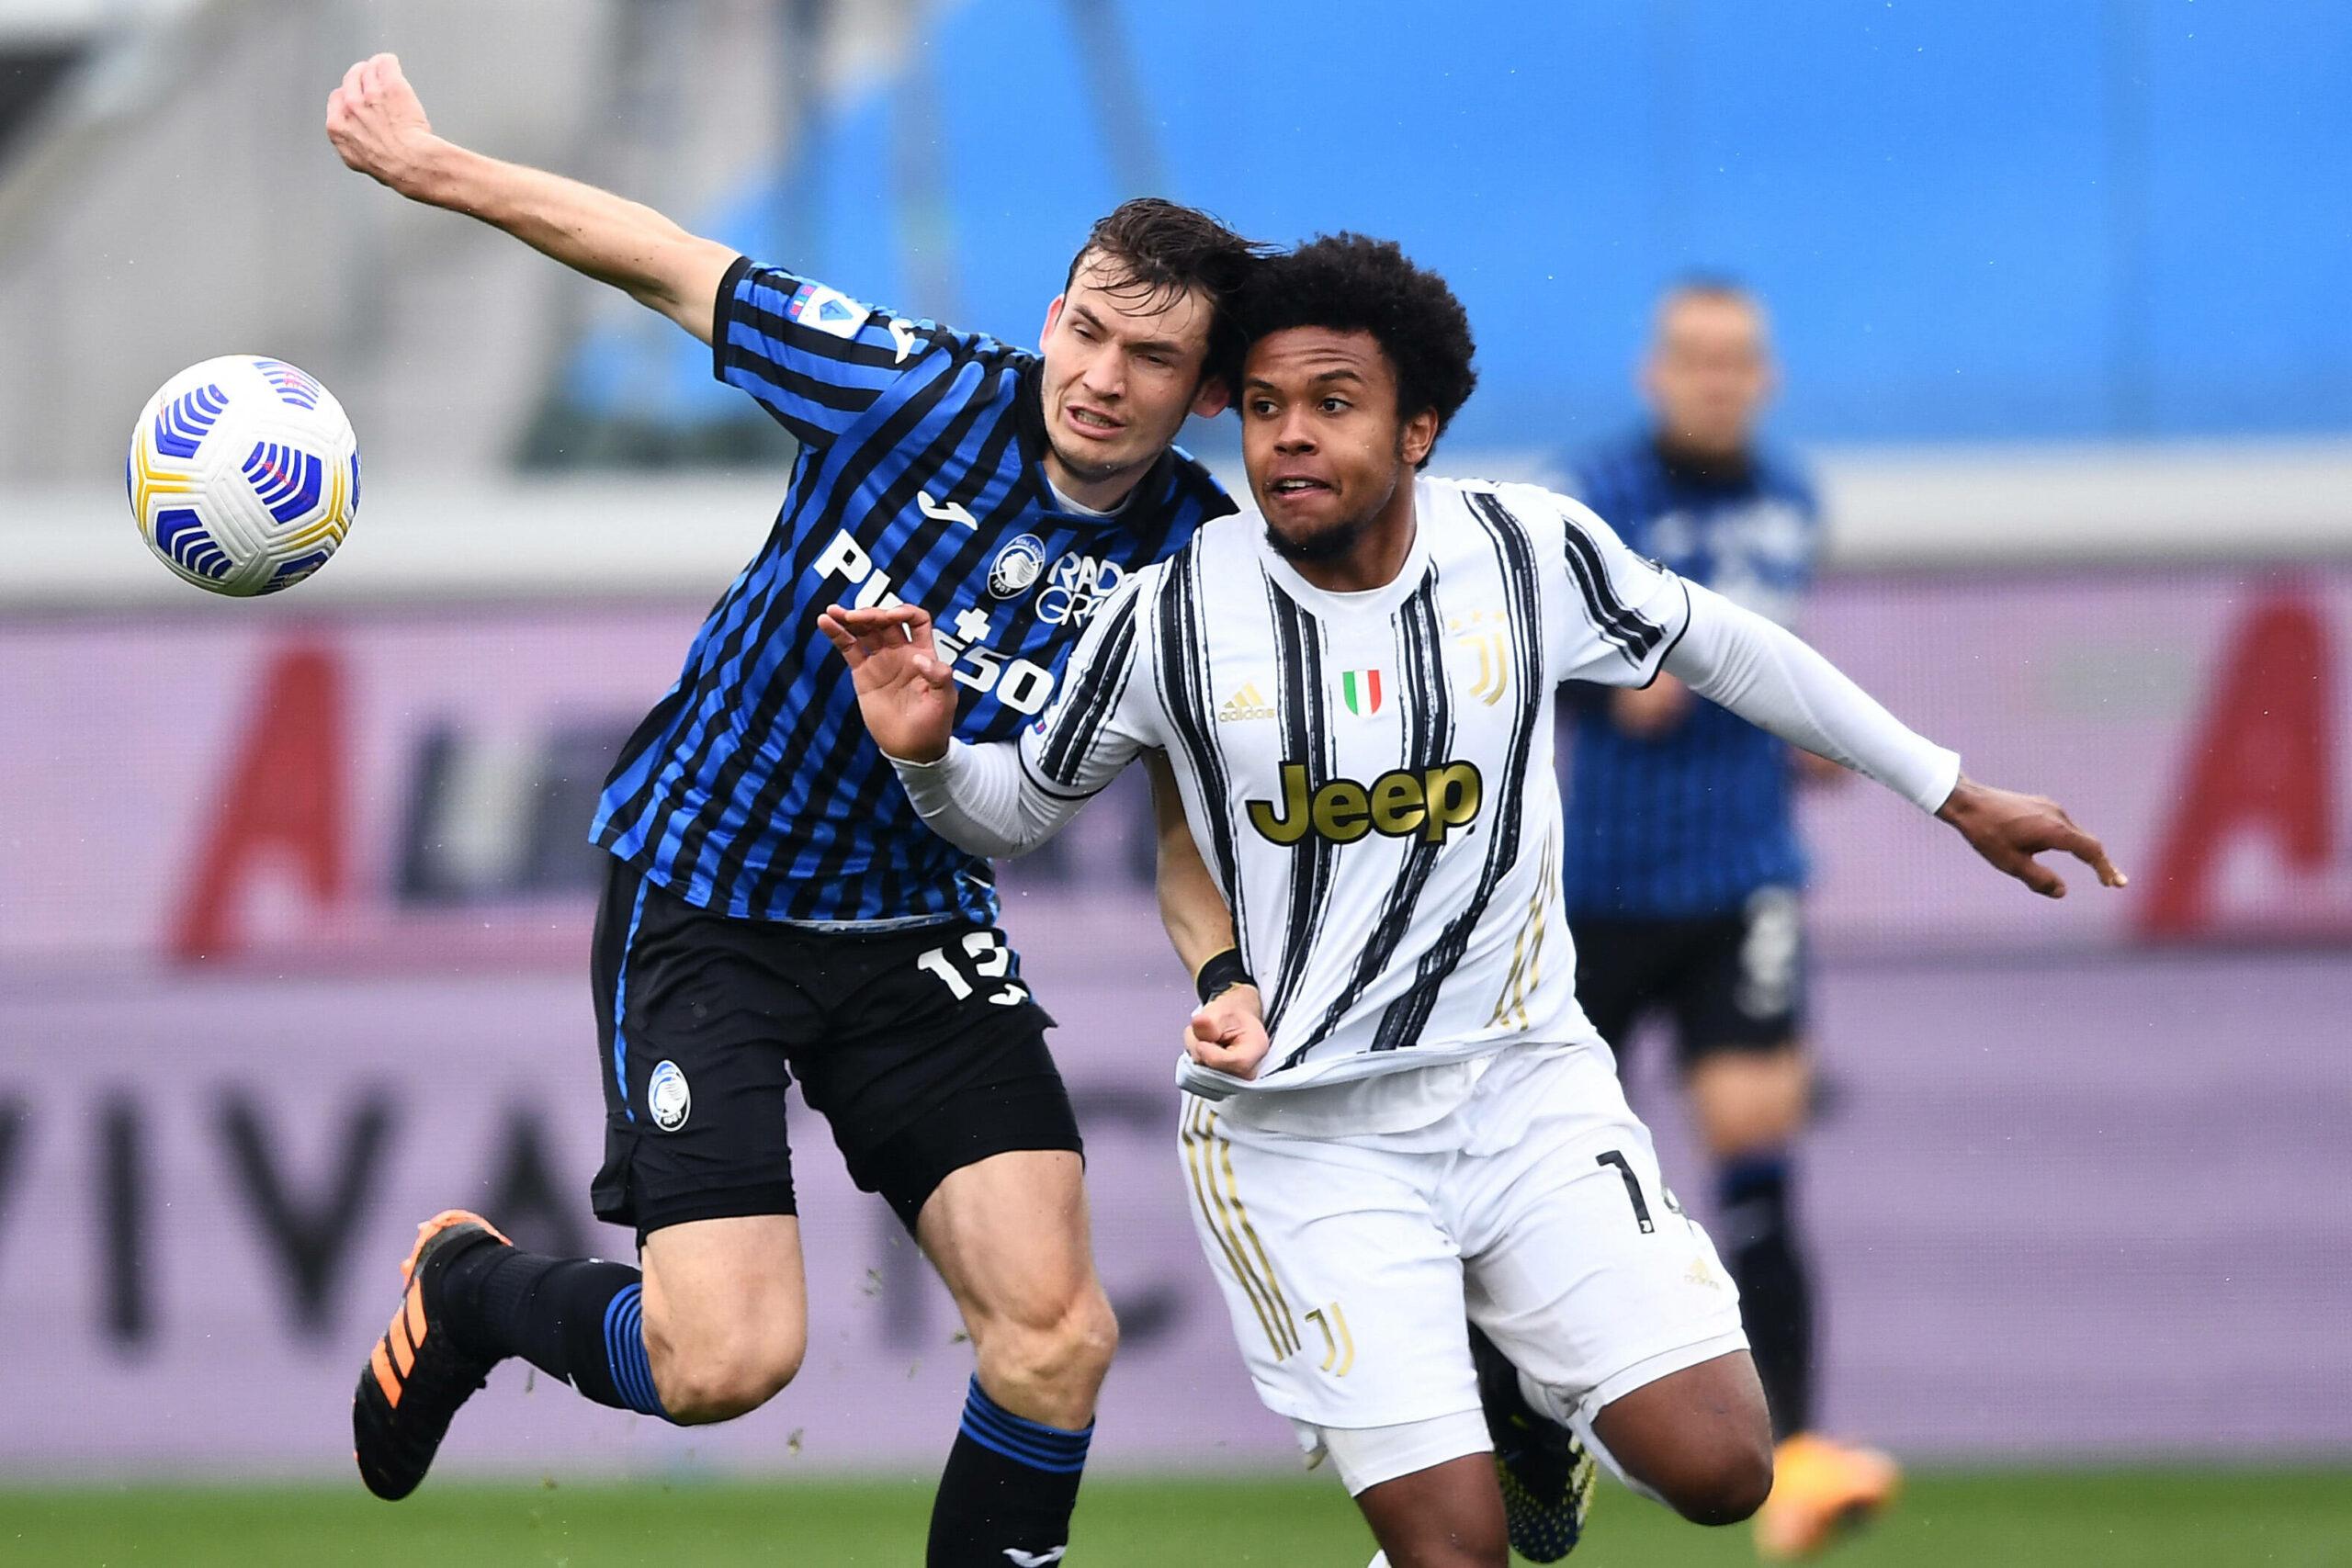 Bergamo Juventus Turin